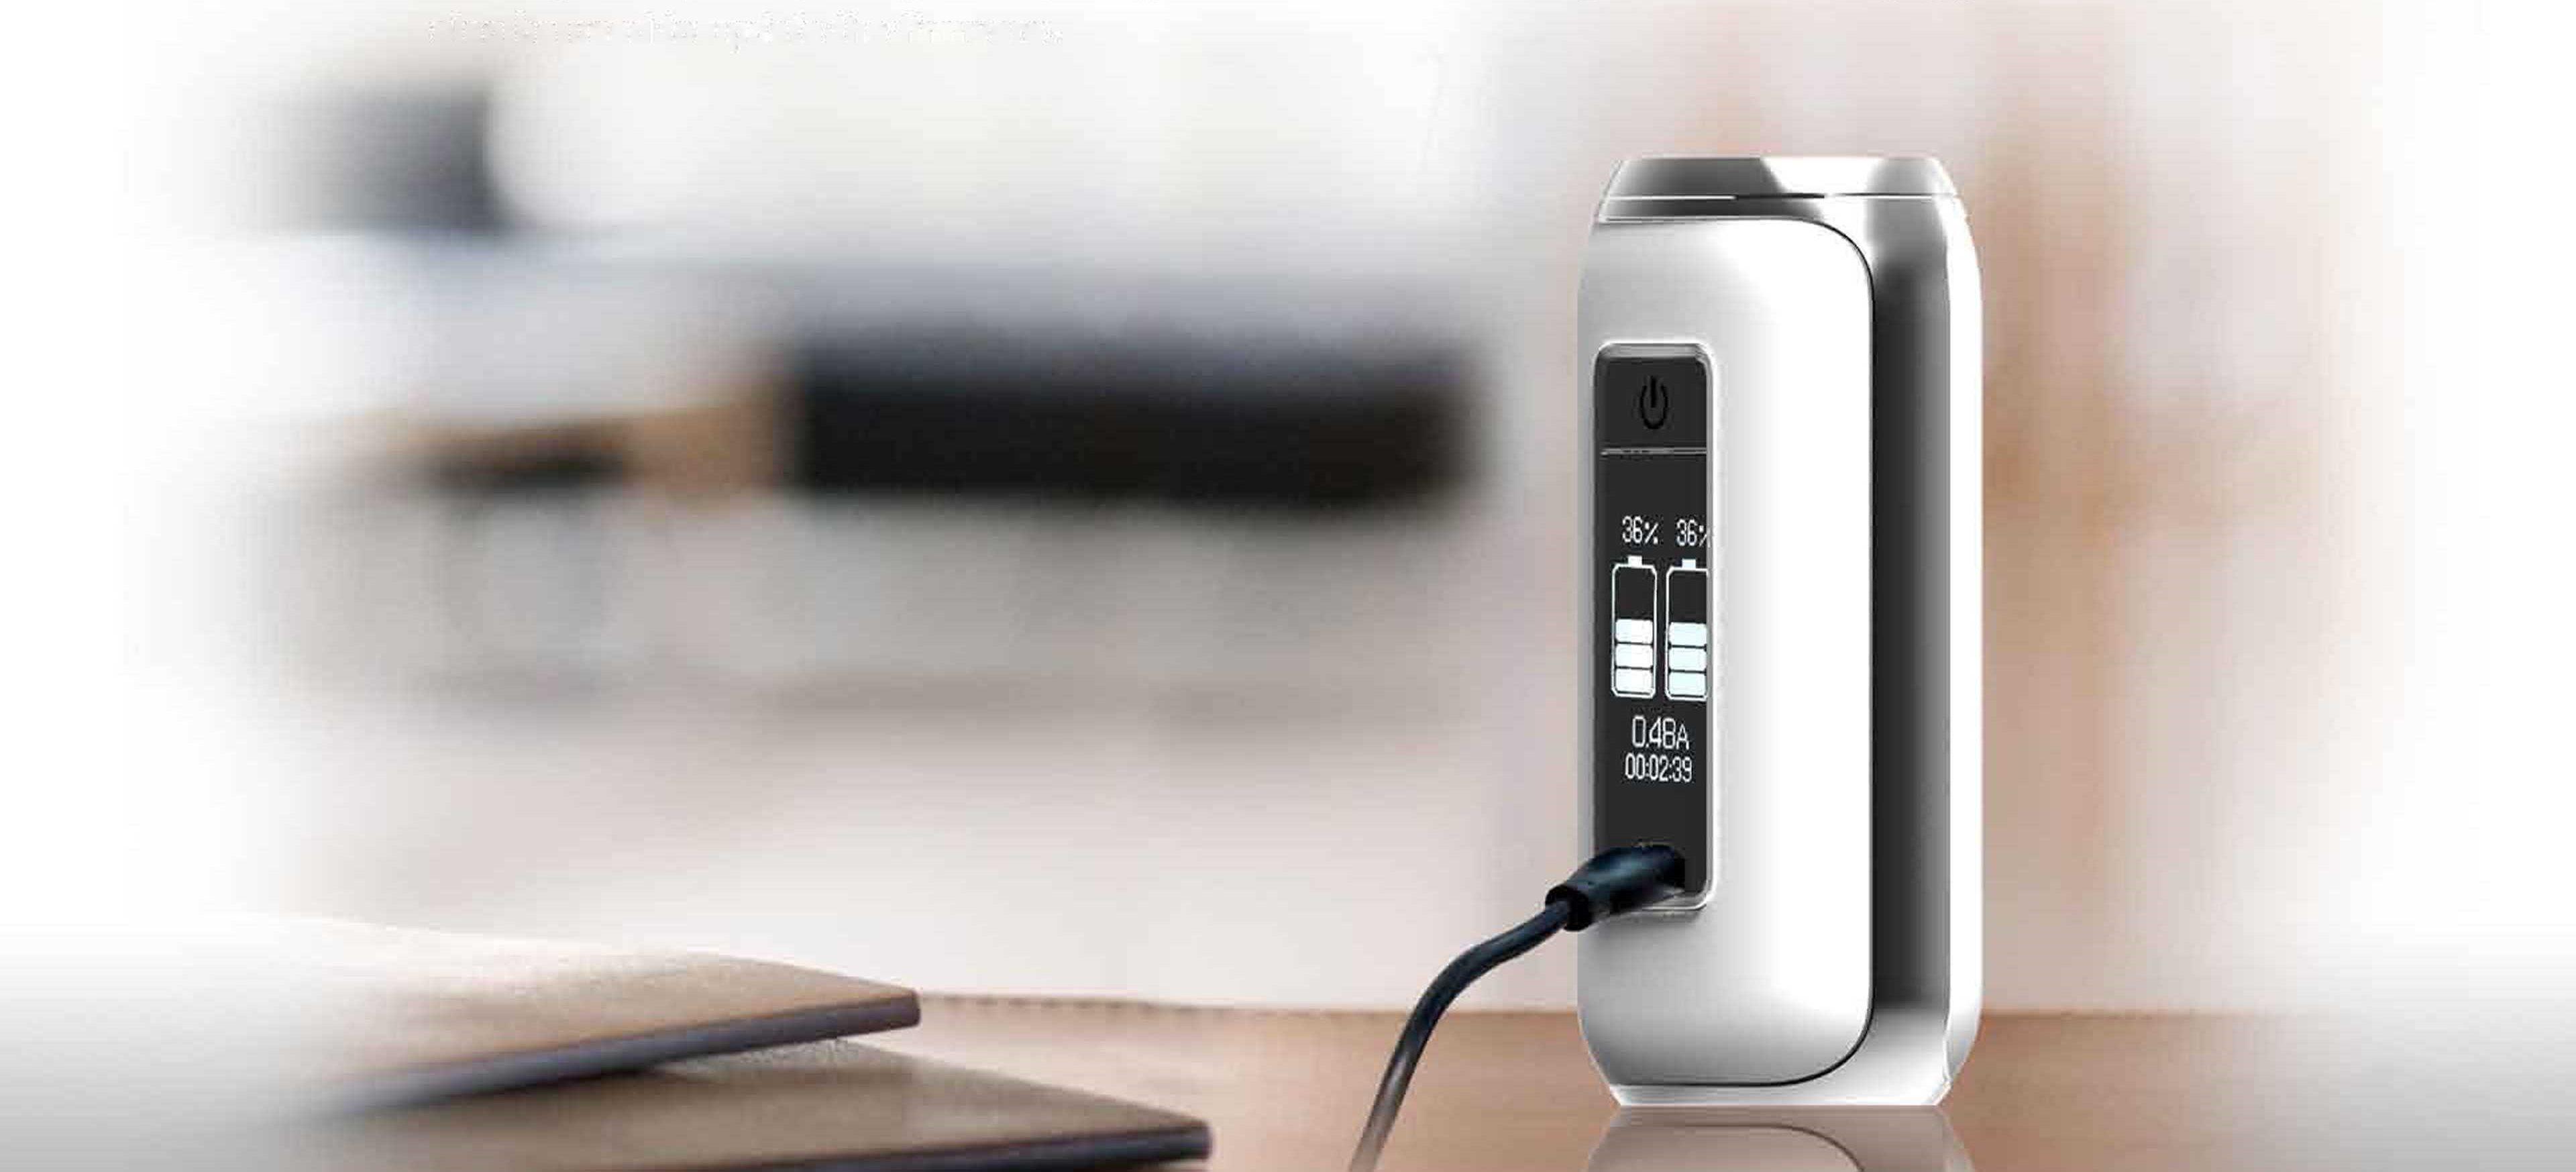 Aspire SkyStar Mod Charging